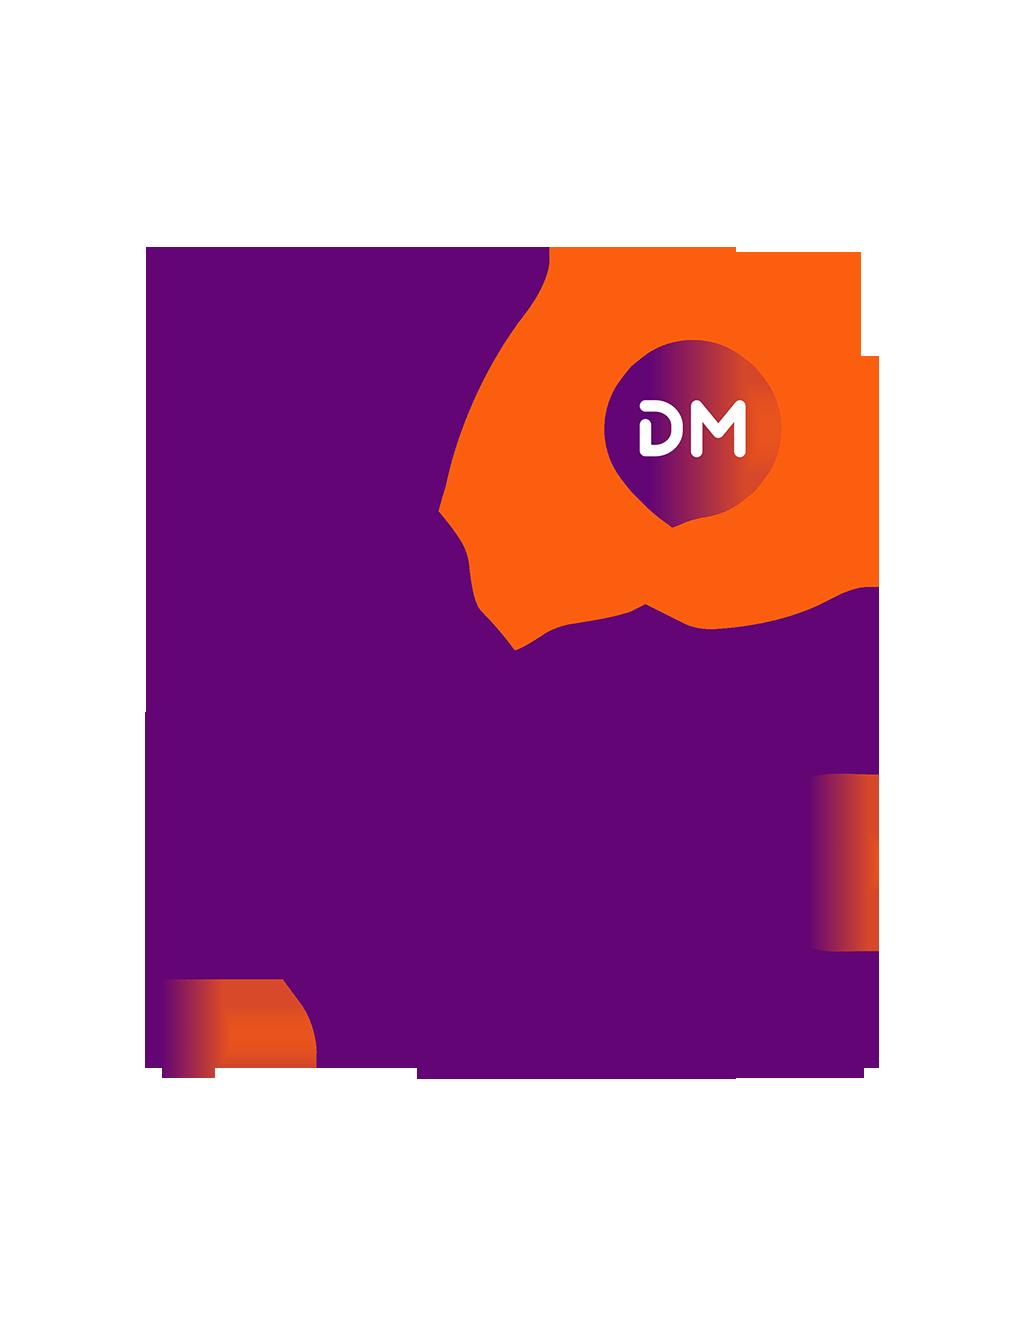 MORE DM, a chatbot developer